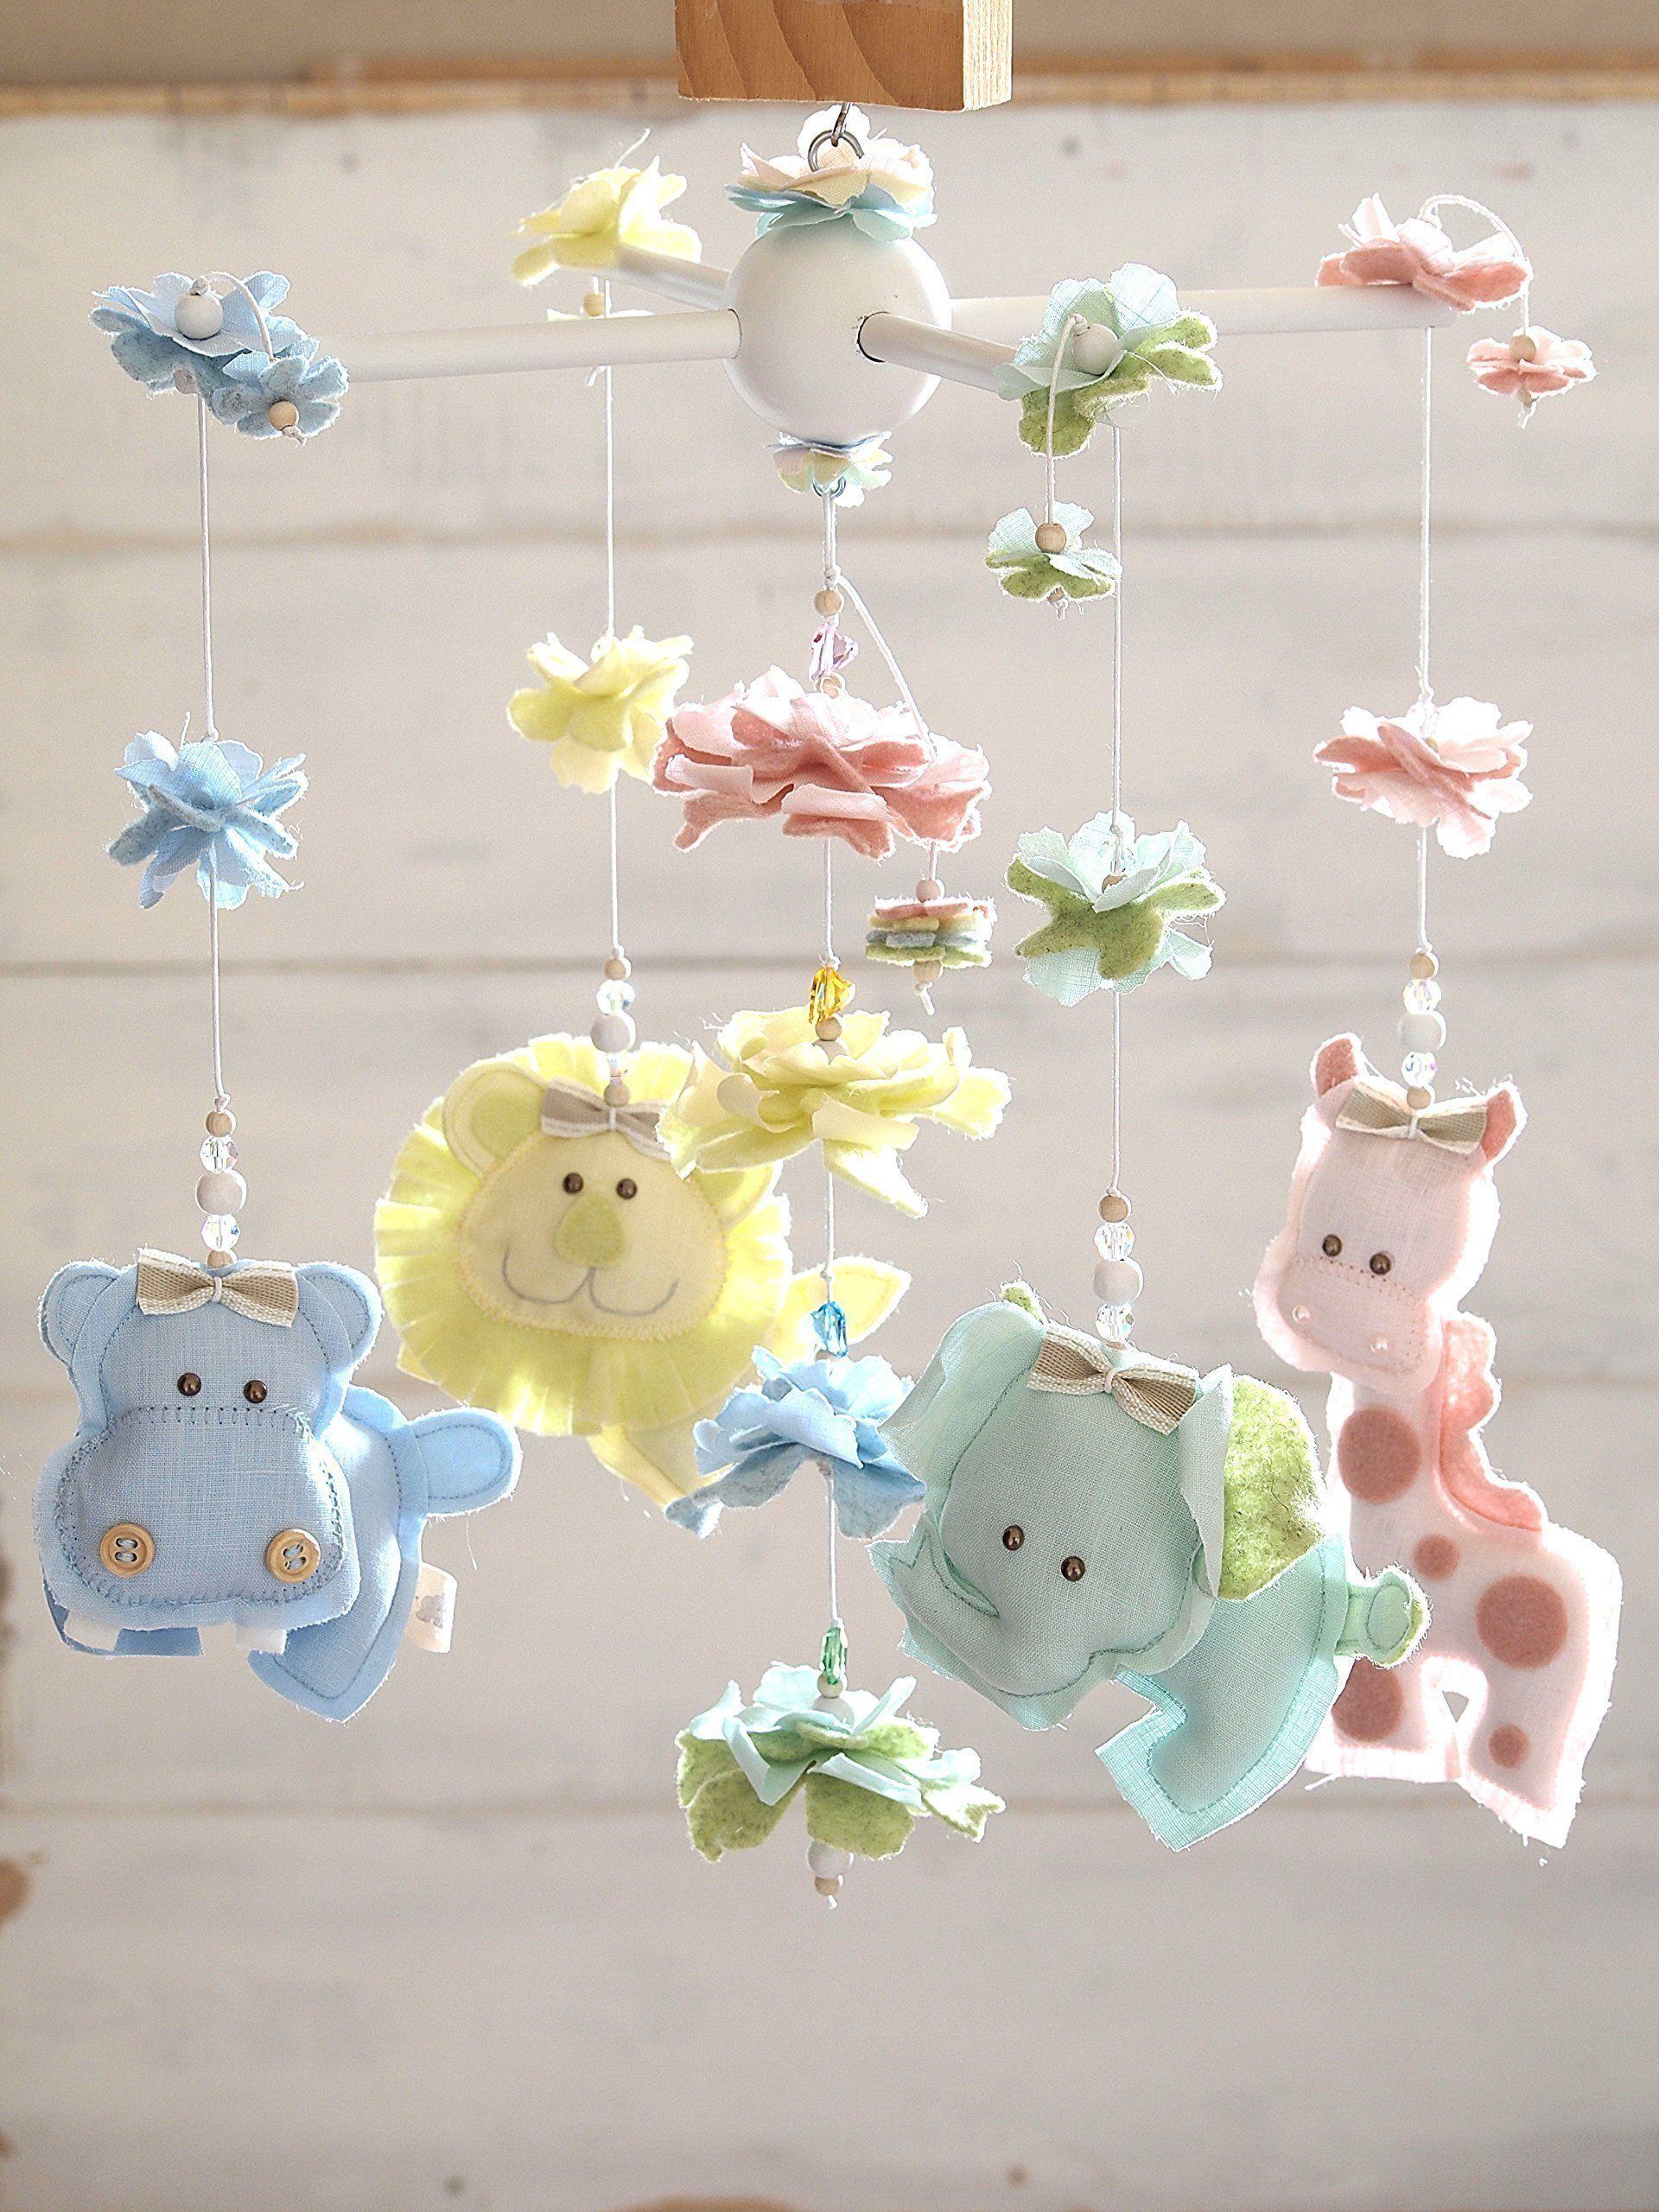 Baby cribs for free - Colorful Jungle Mobile With Swarovski Crystals Safari Nursery Decor Baby Crib Mobile Free